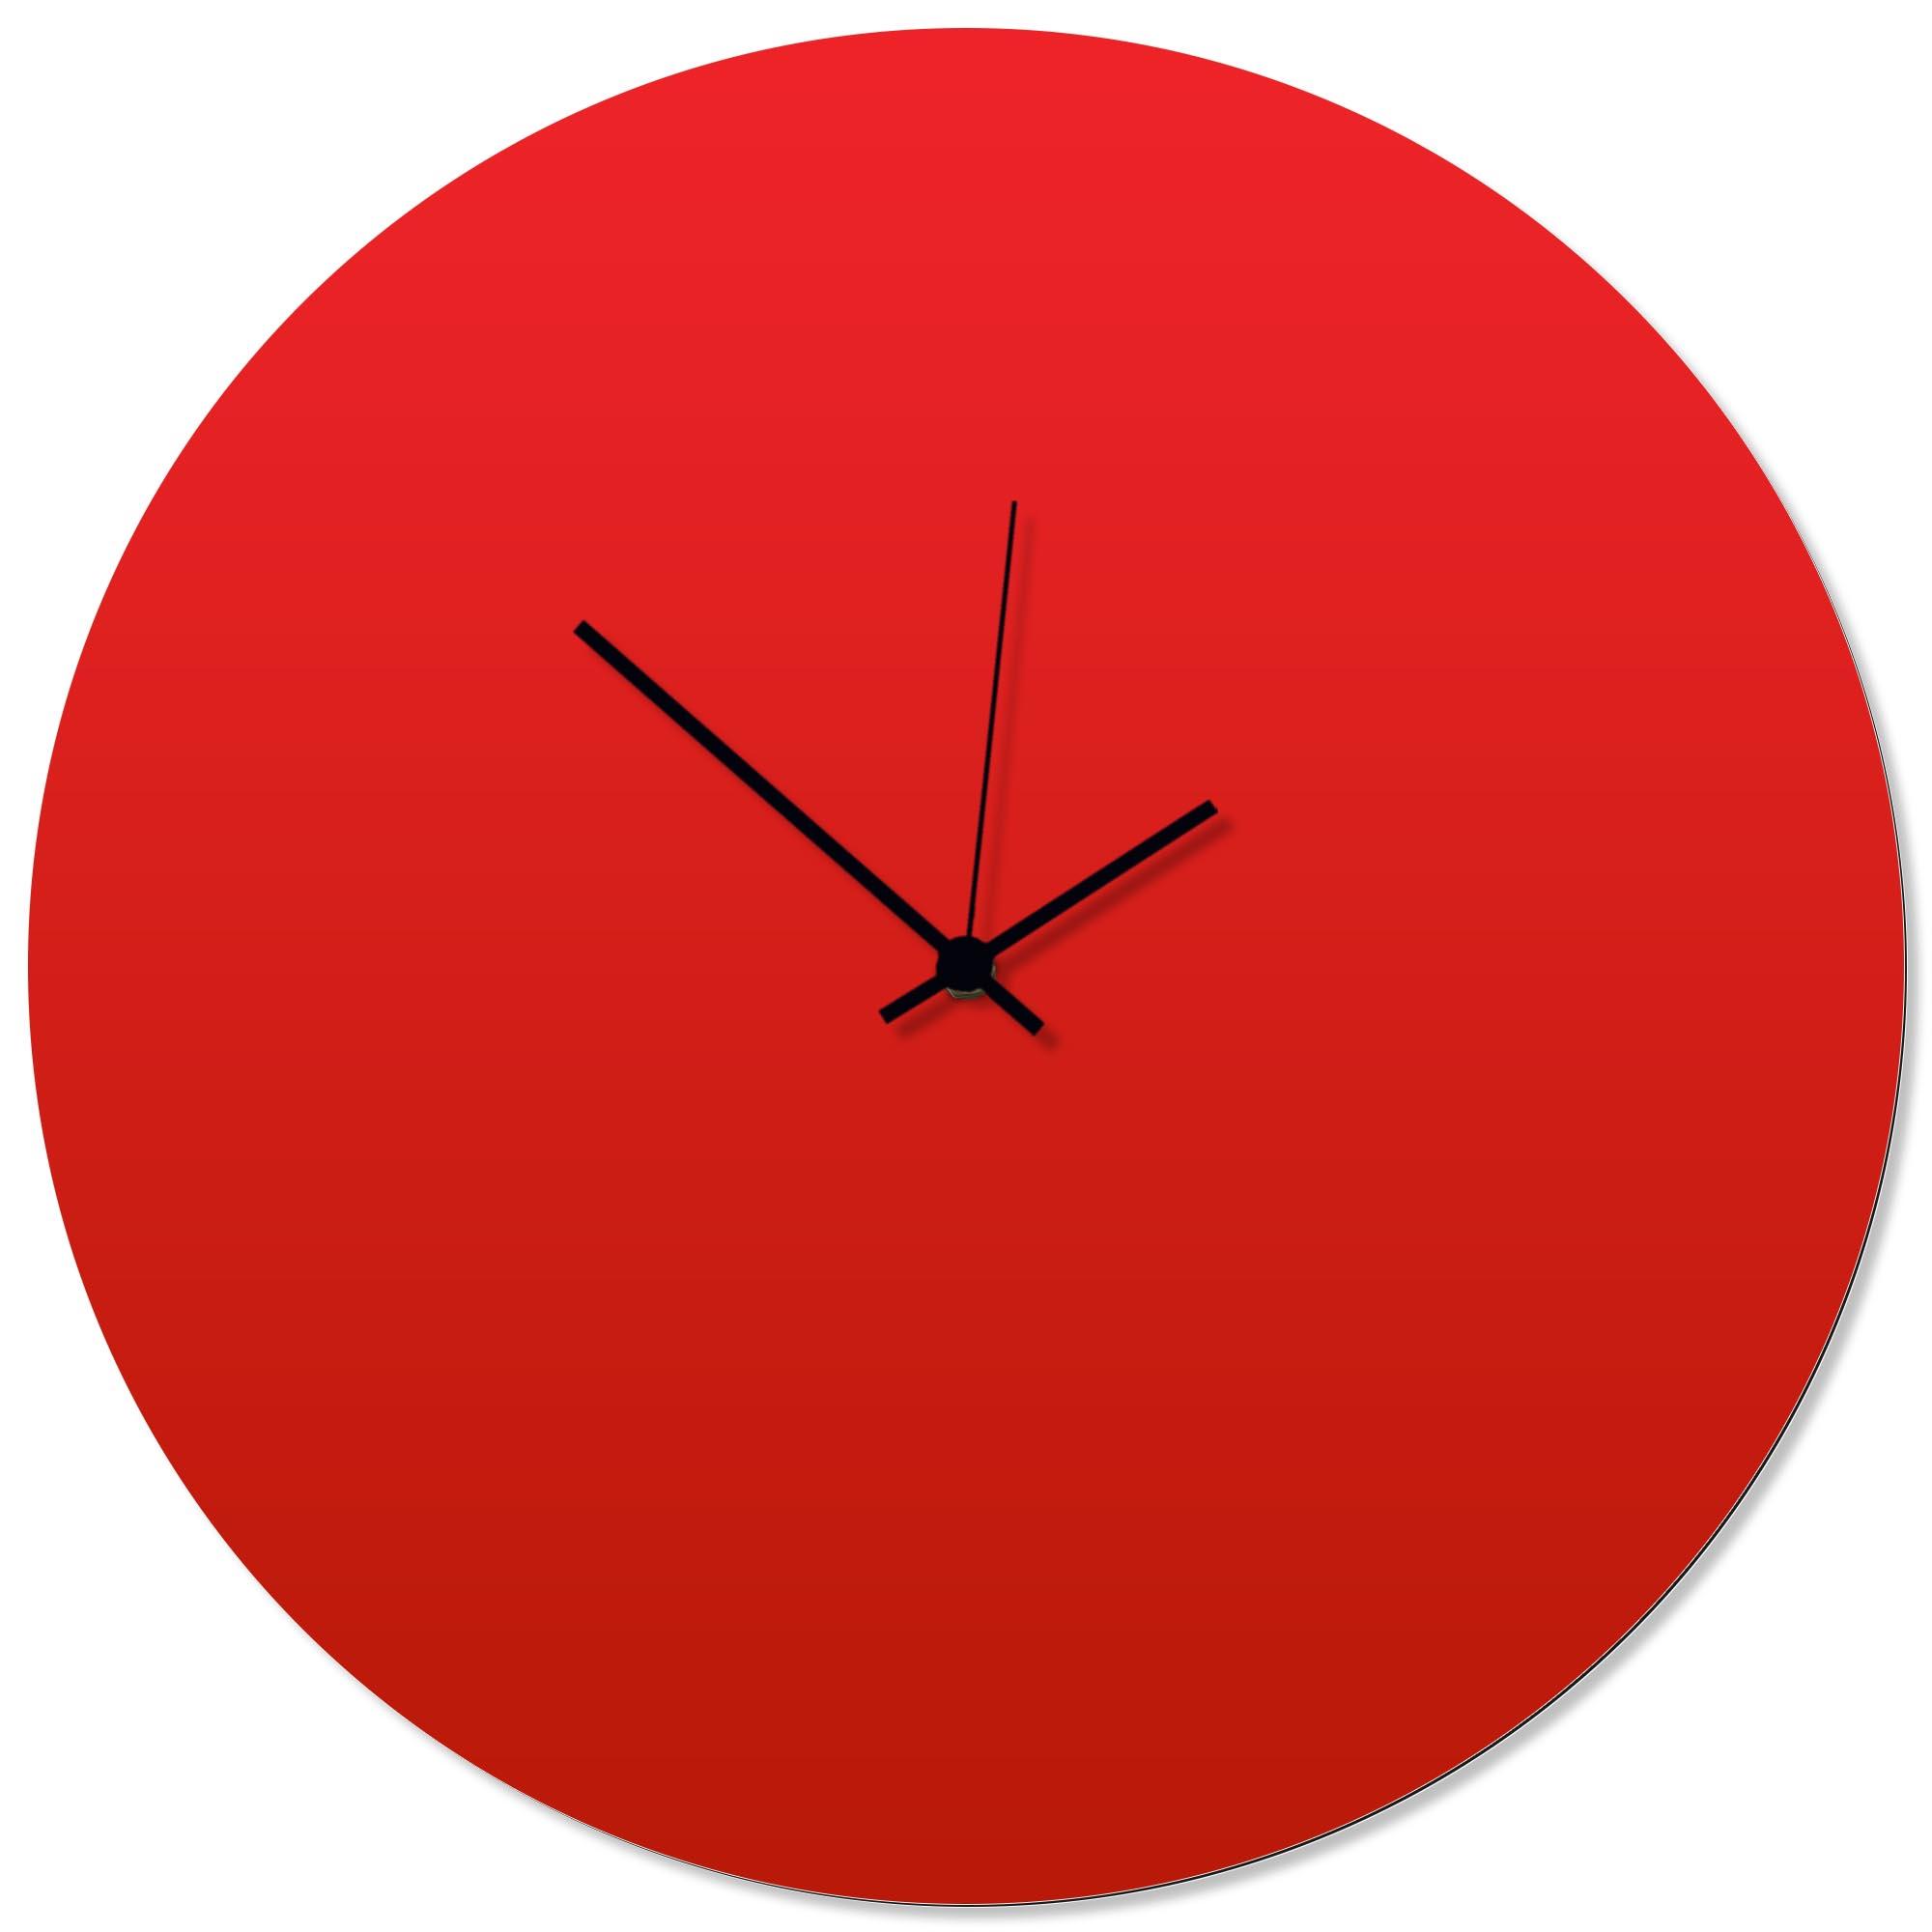 Redout Black Circle Clock Large 23x23in. Aluminum Polymetal